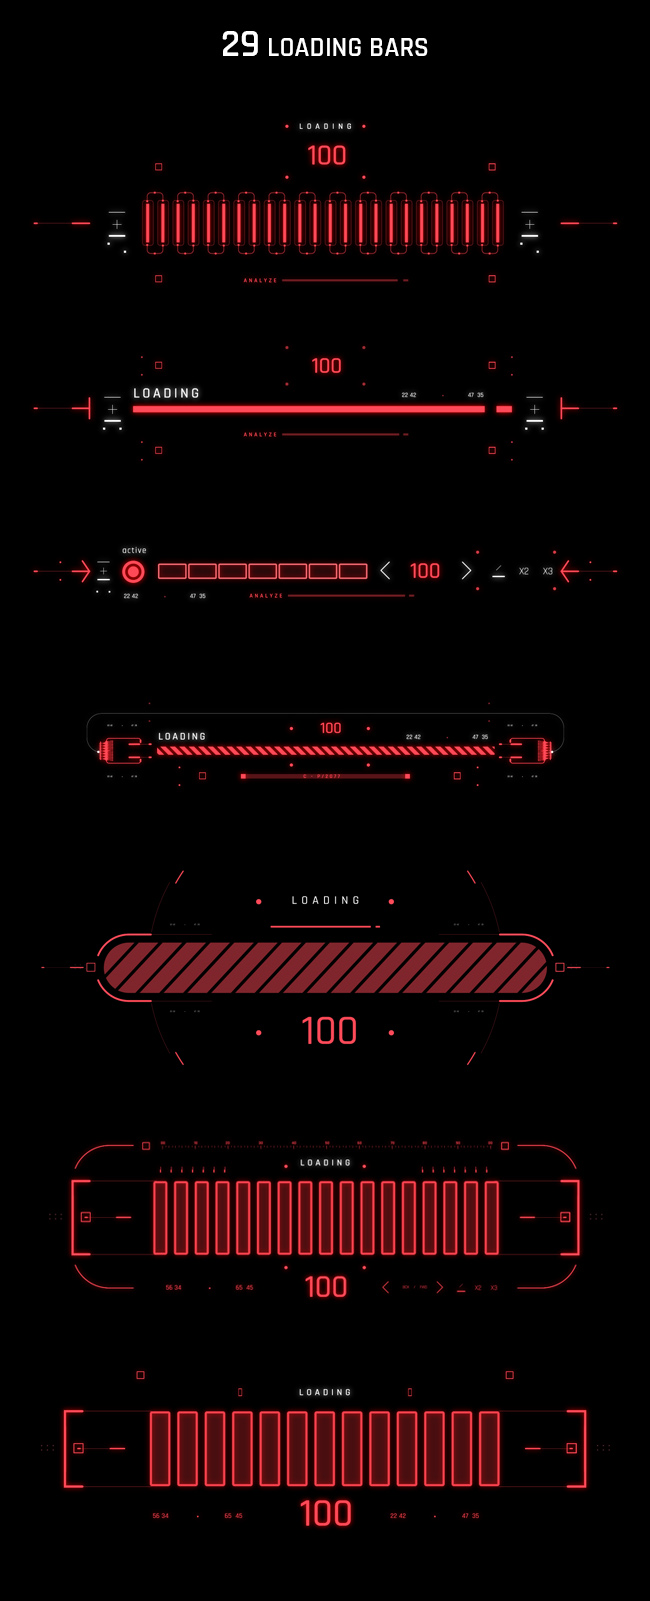 AE脚本-500个HUD高科技赛博朋克UI科幻界面元素动画预设包 Cyberpunk HUD UI 500+ 已修复中文版AE表达式报错插图21